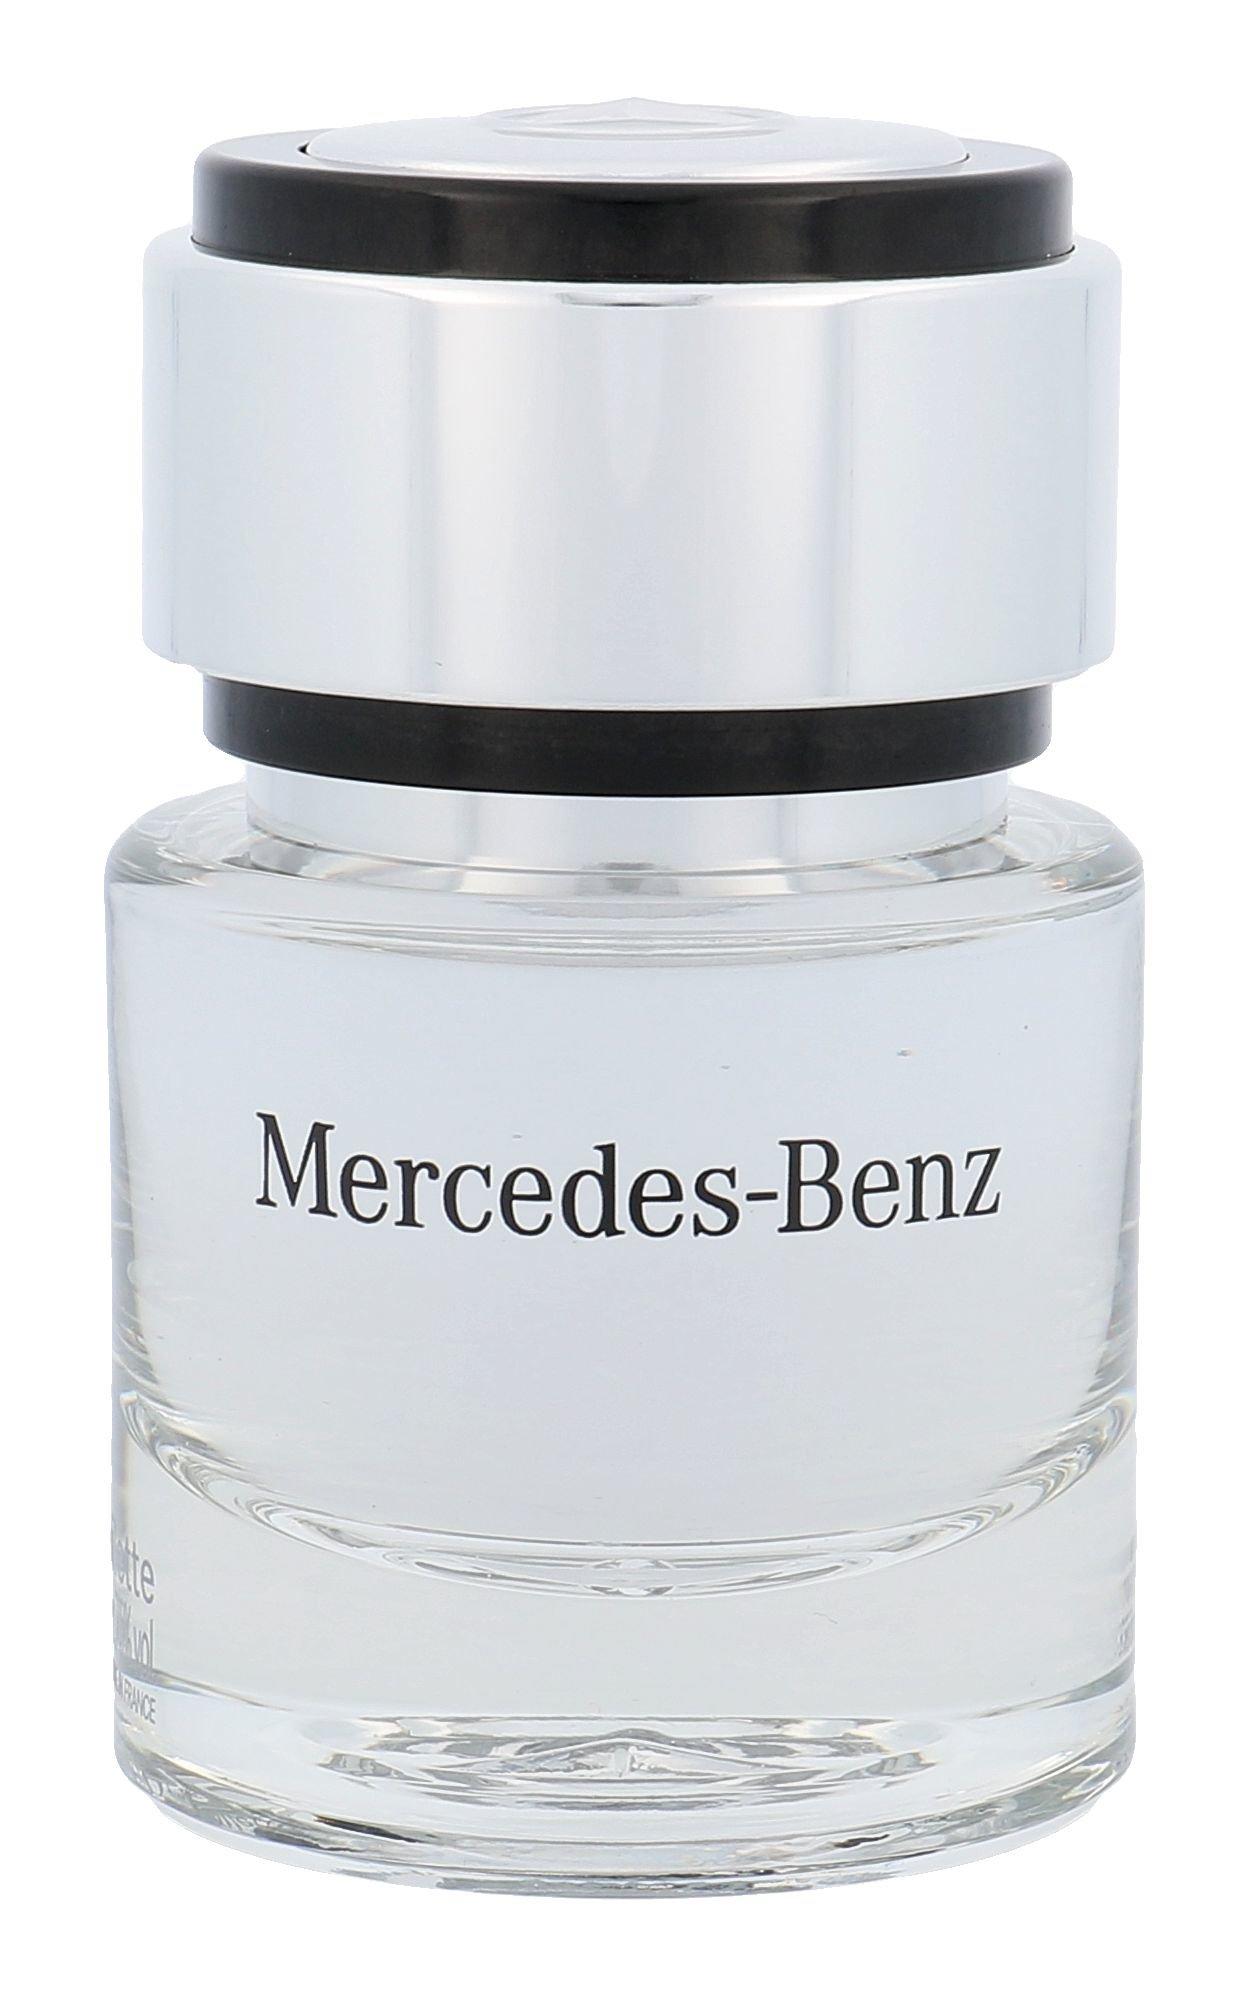 Mercedes-Benz Mercedes-Benz EDT 40ml